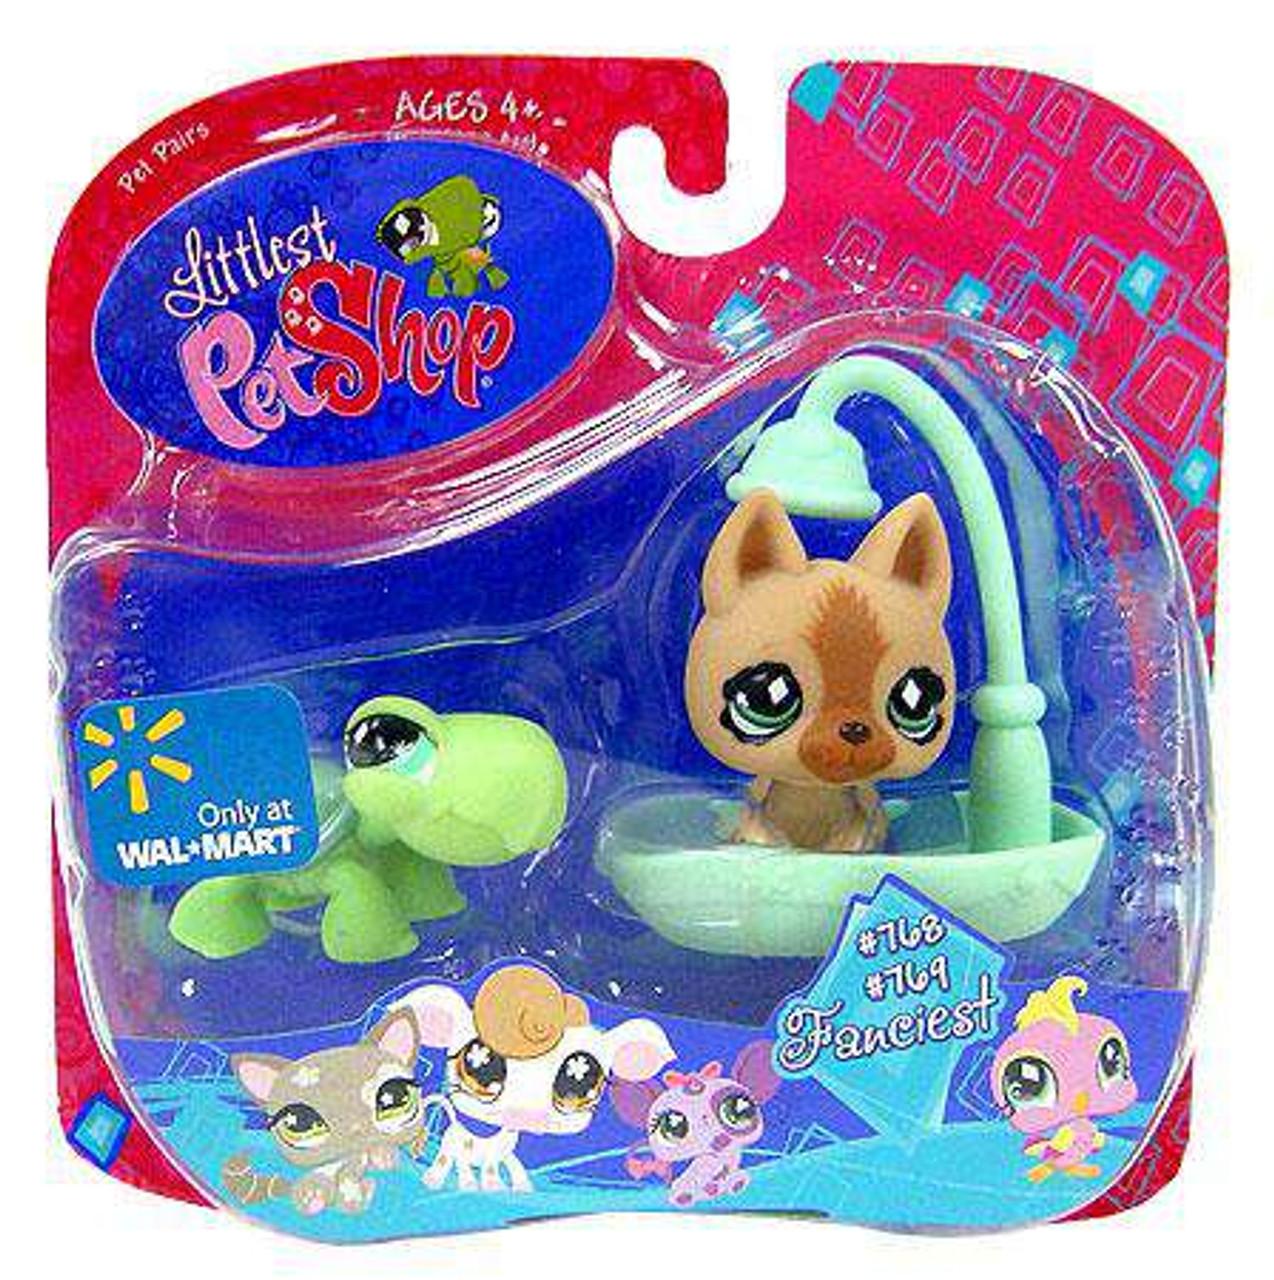 Littlest Pet Shop Fanciest Pet Pair Turtle Brown German Shepard Figure 2 Pack Hasbro Toys Toywiz